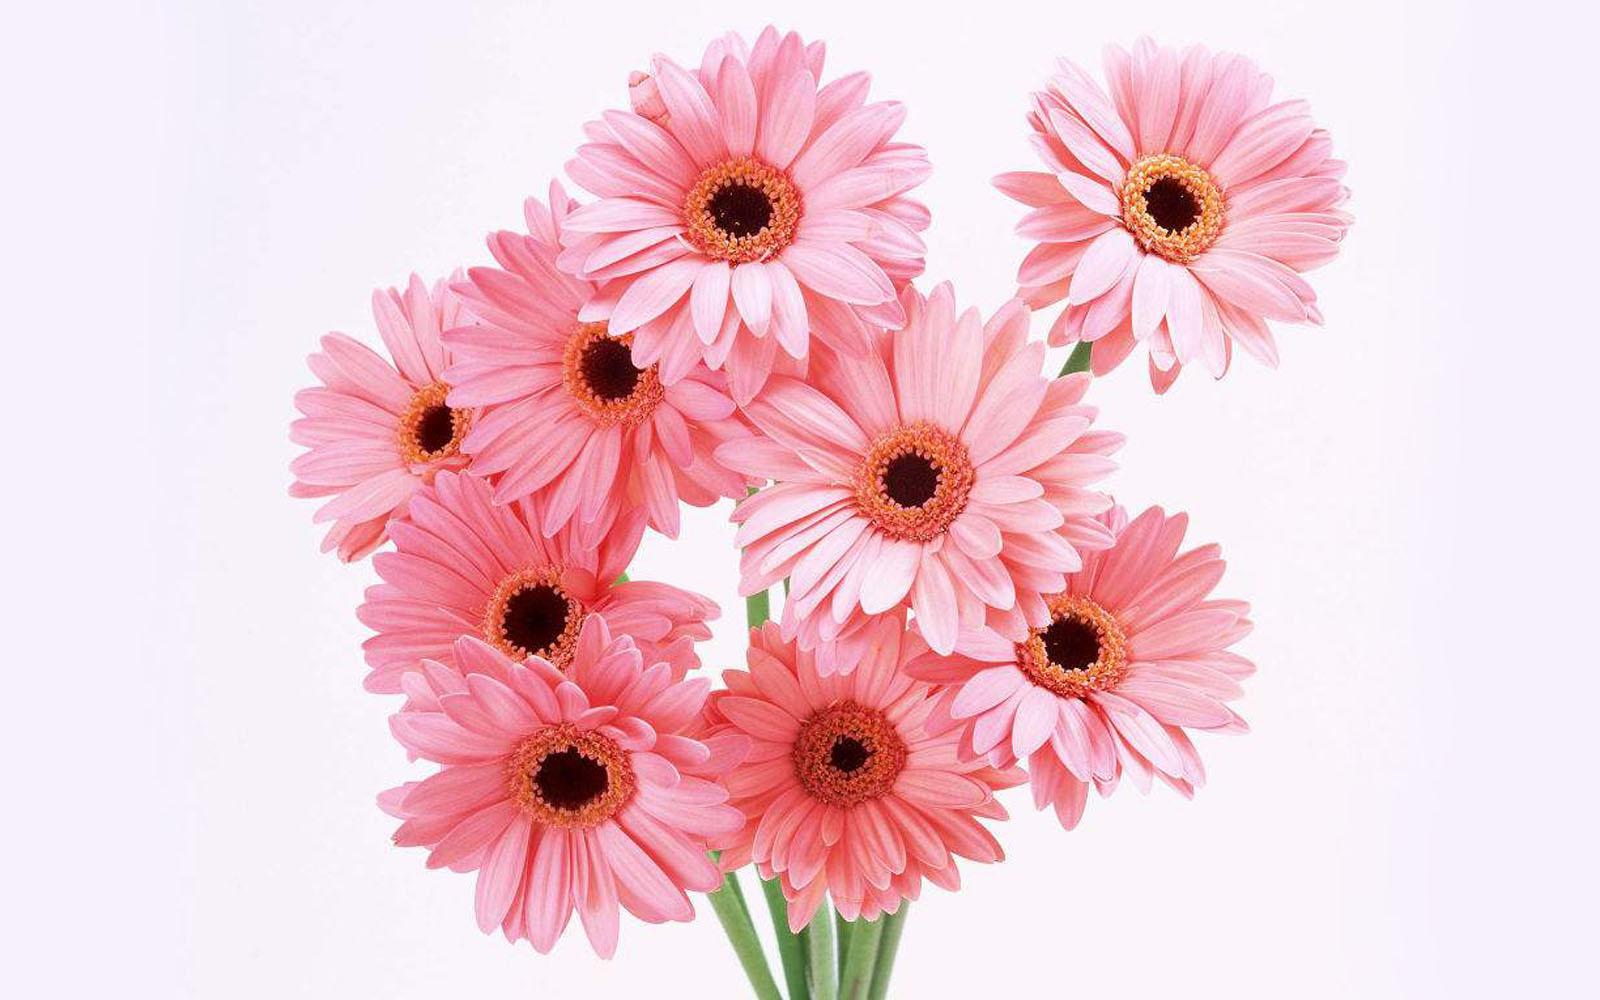 Download Apple Wallpaper Hd For Windows 7 Wallpapers Gerbera Flowers Wallpapers